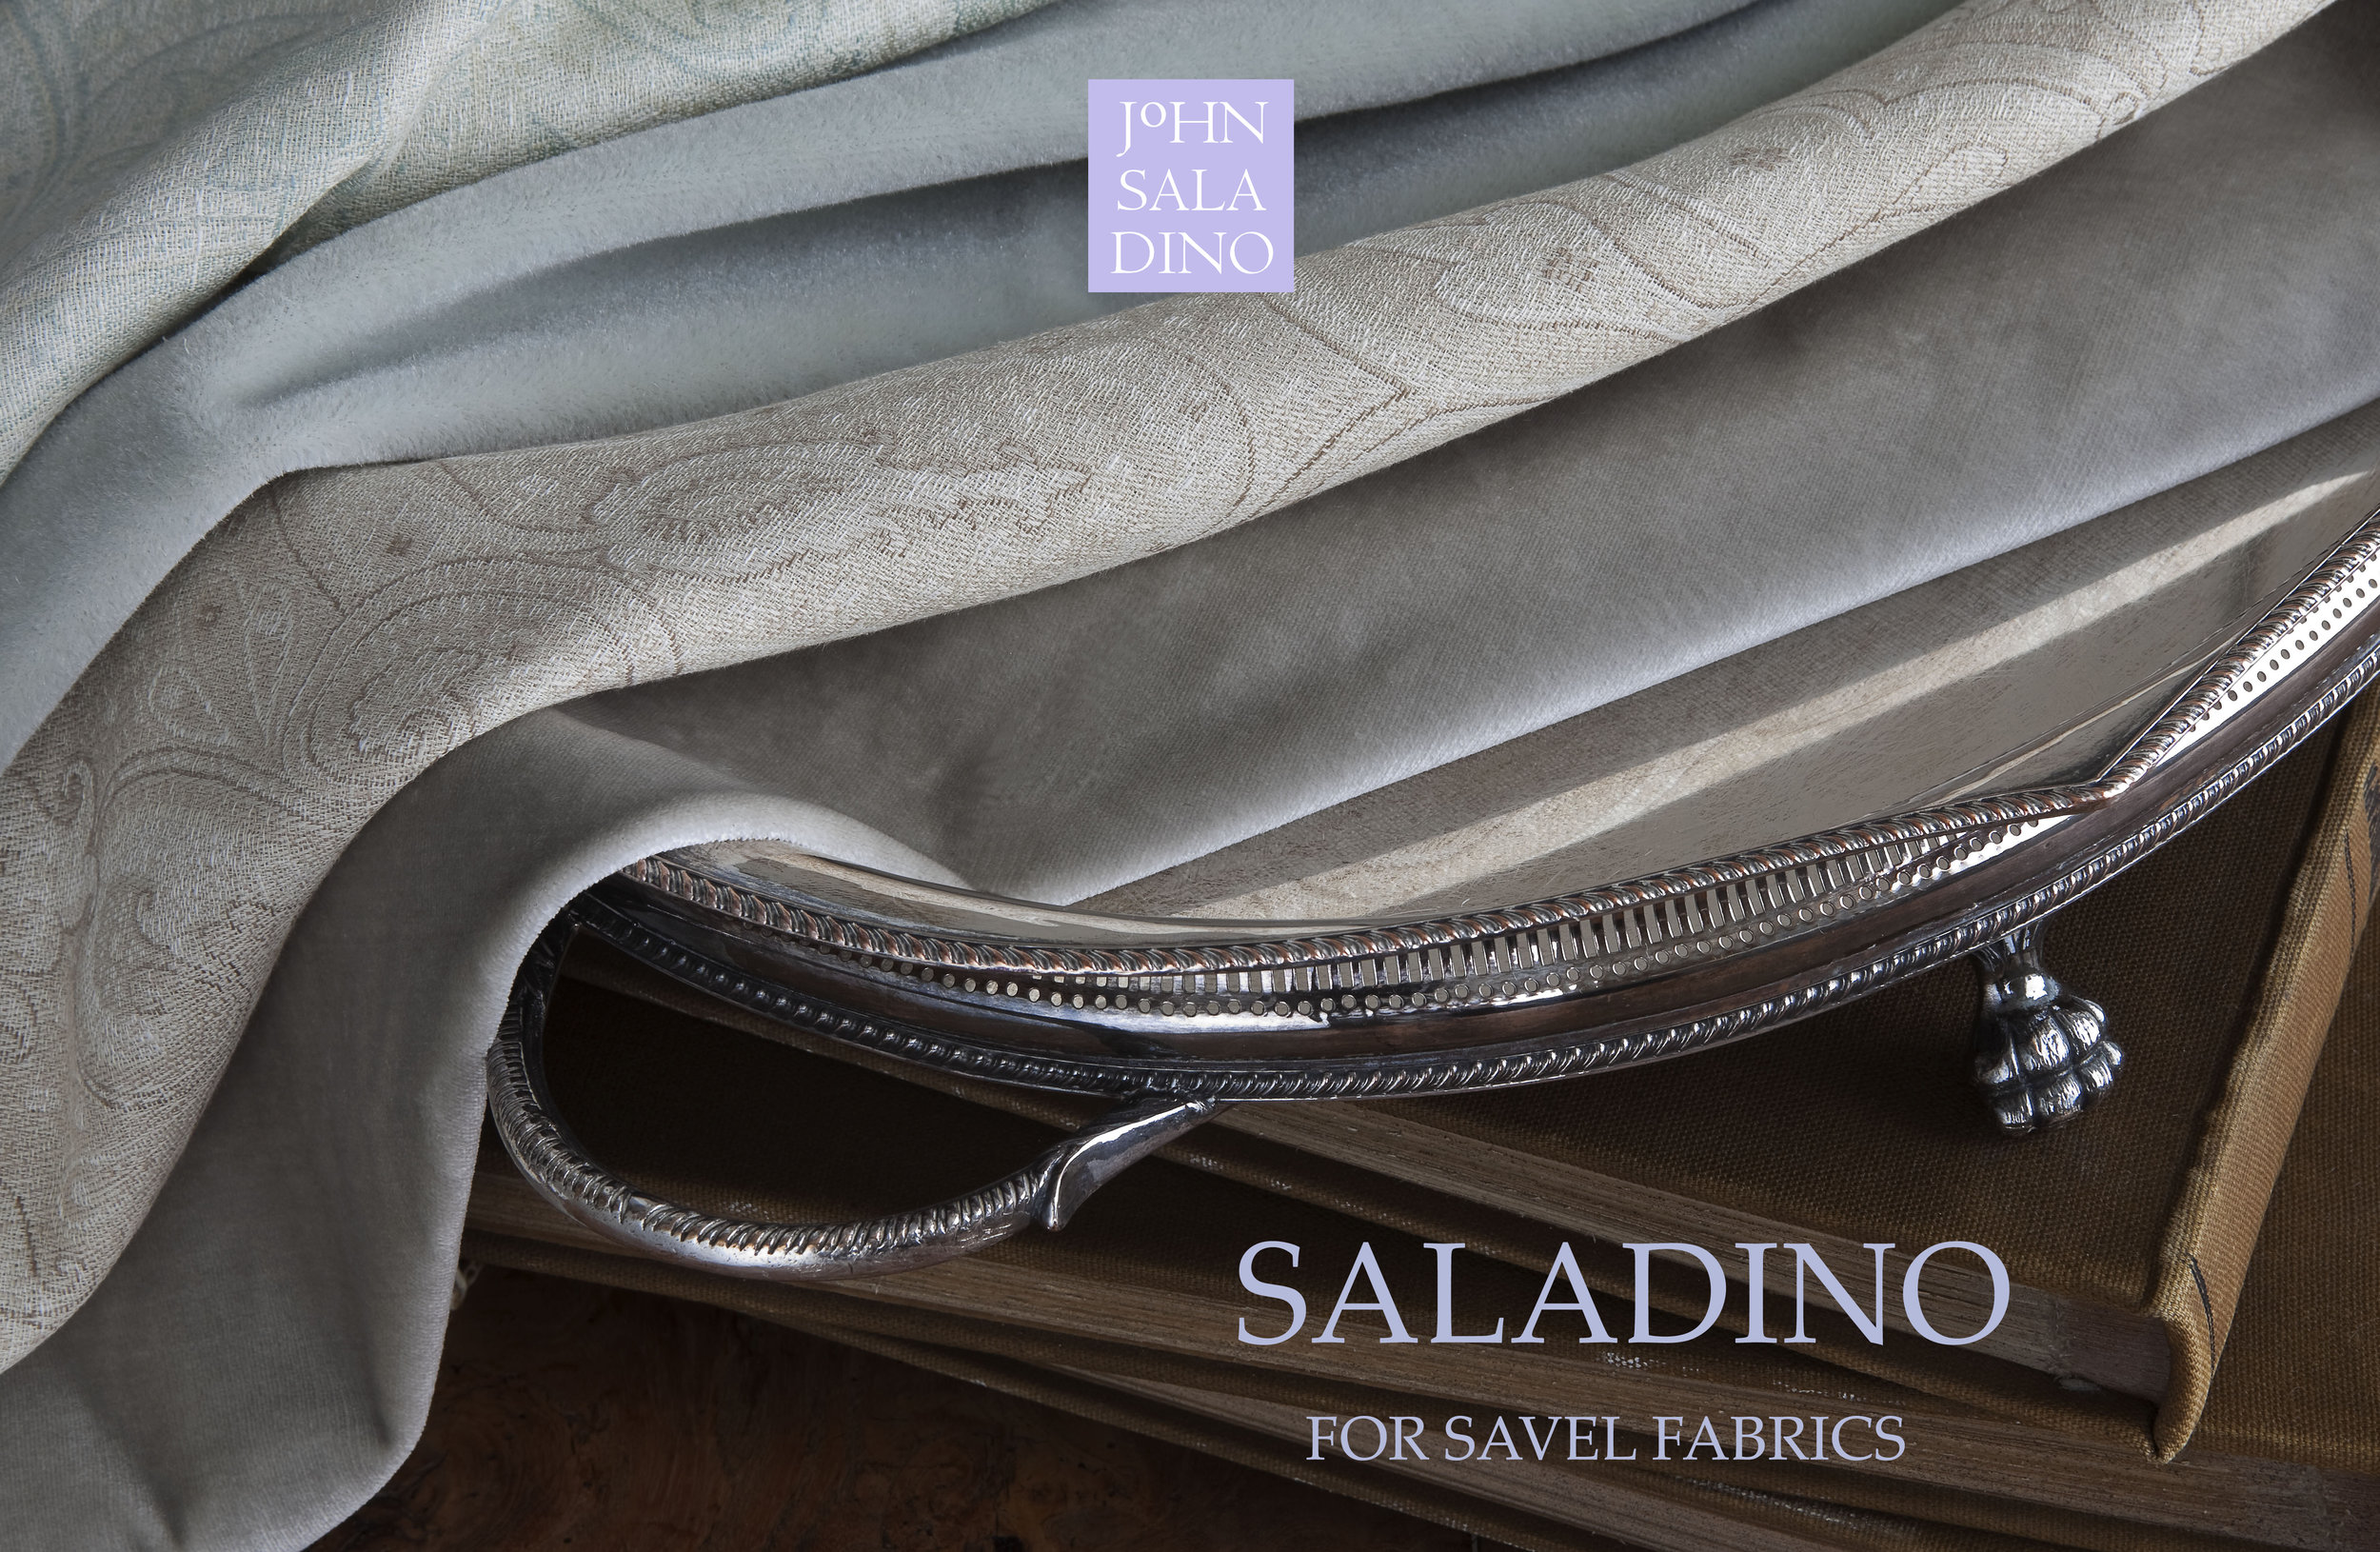 Saladinofor SavelTextiles.jpg